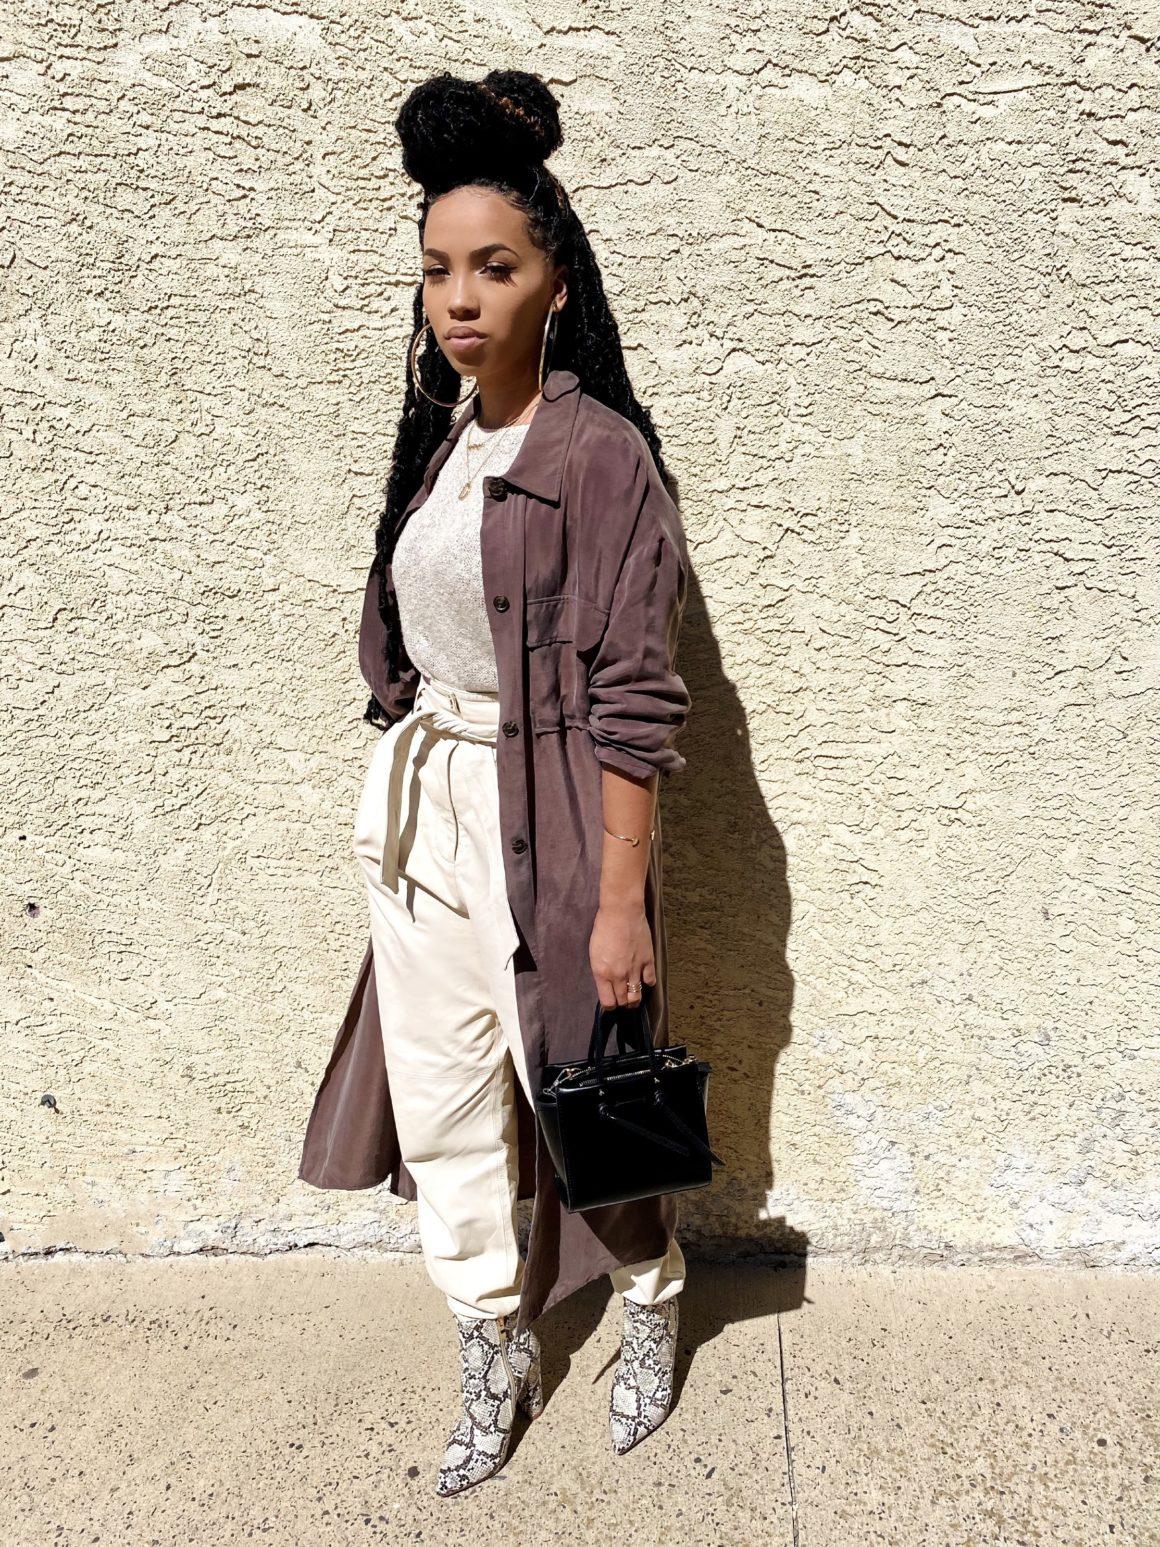 Fashion Bombshell of the Day: Dani from Washington D.C.